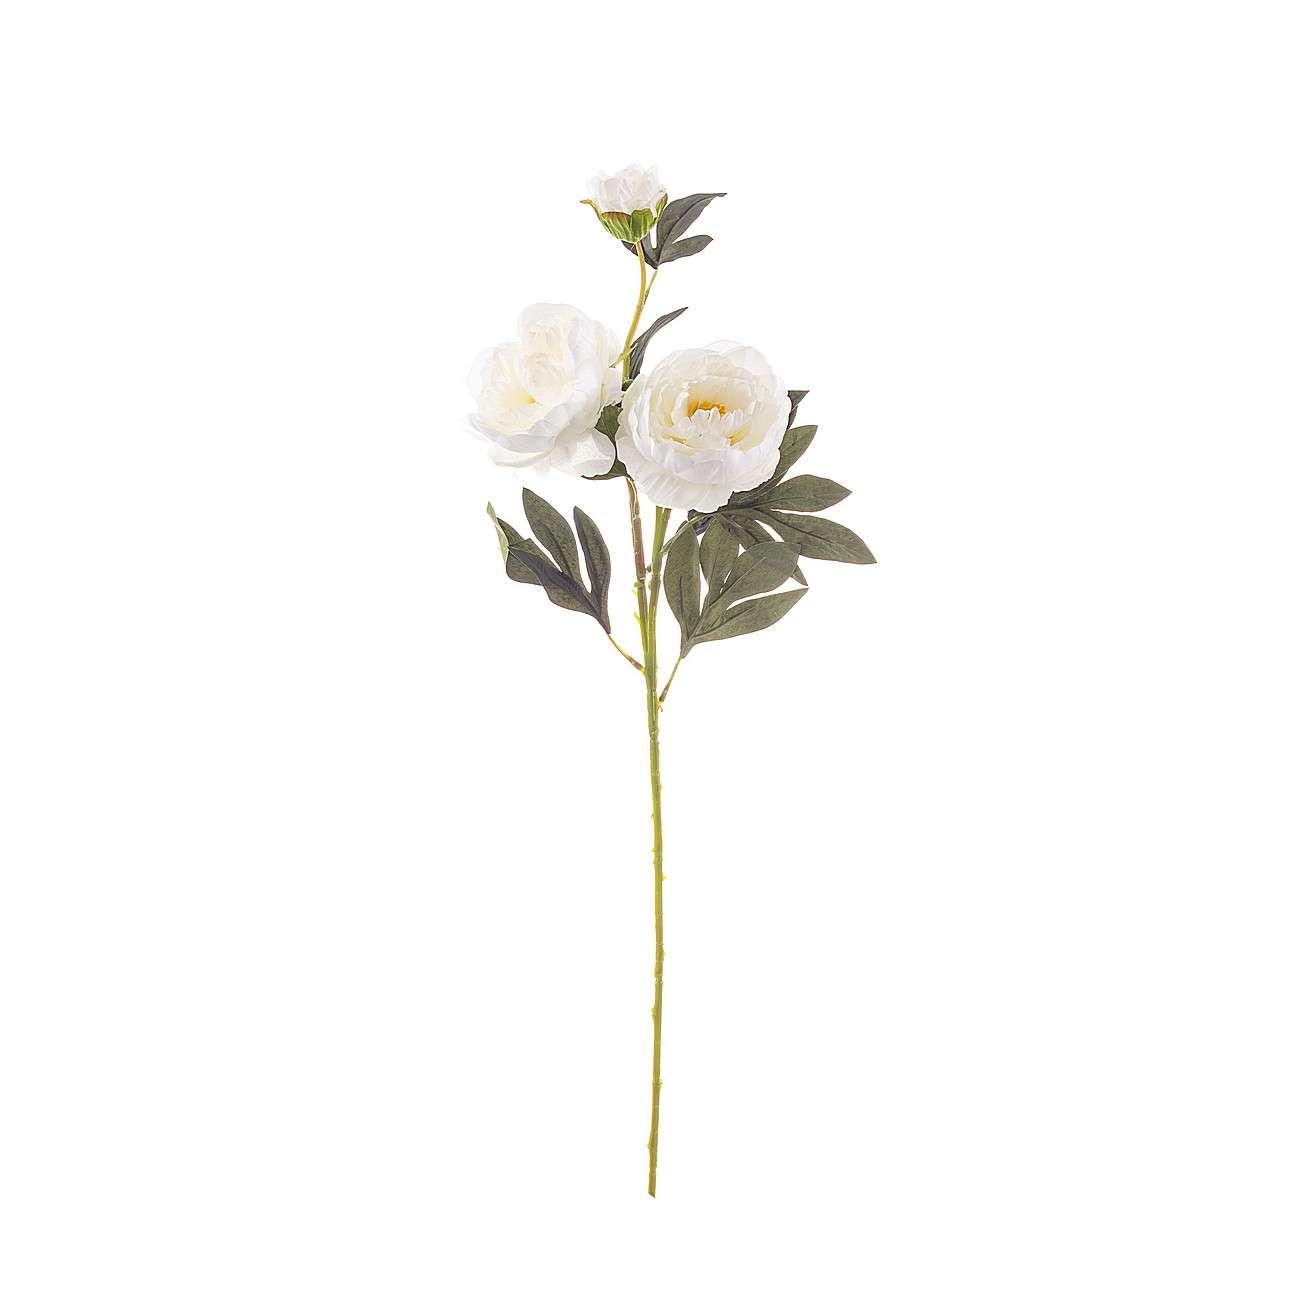 Kunstblume White Peony 75cm, 75 cm  | Dekoration > Dekopflanzen > Kunstpflanzen | Dekoria